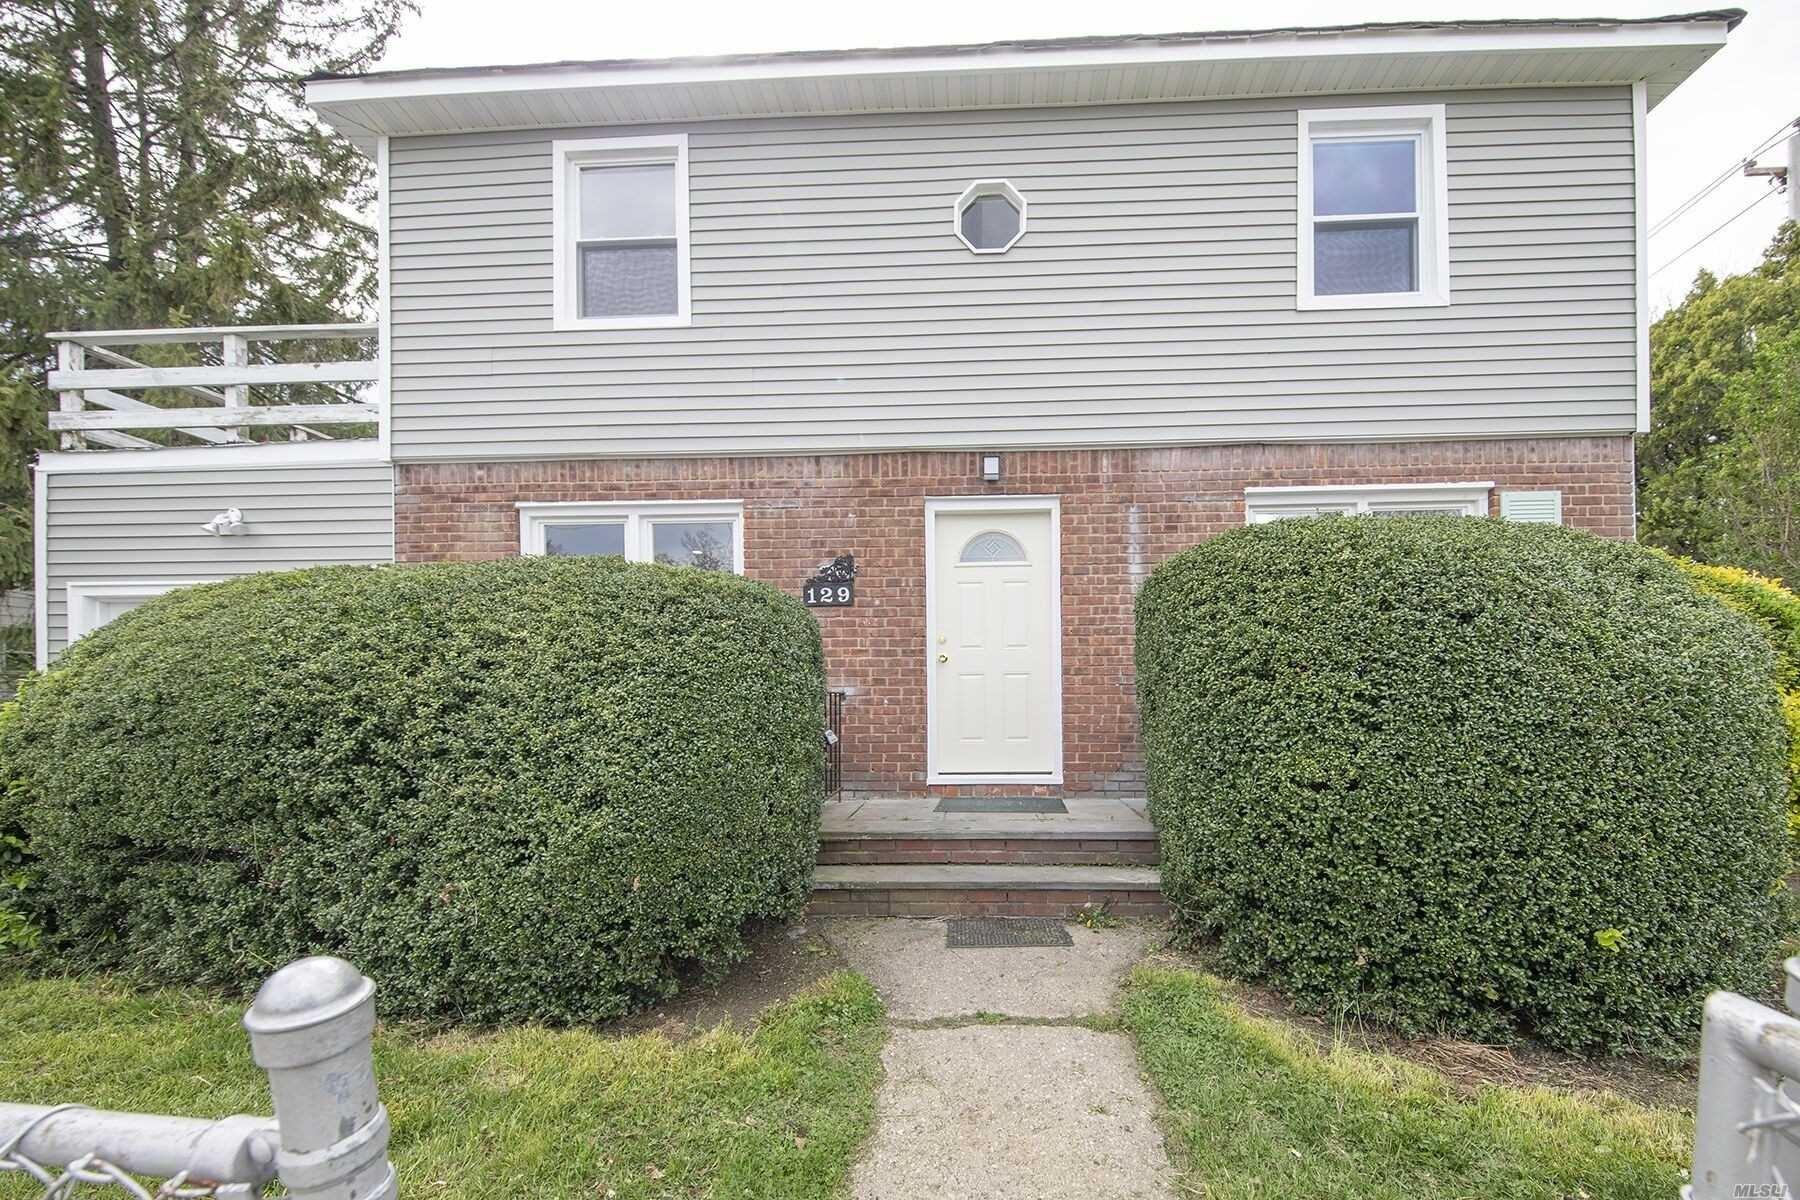 129 Rutland Rd, Hempstead, NY 11550 - MLS#: 3214410